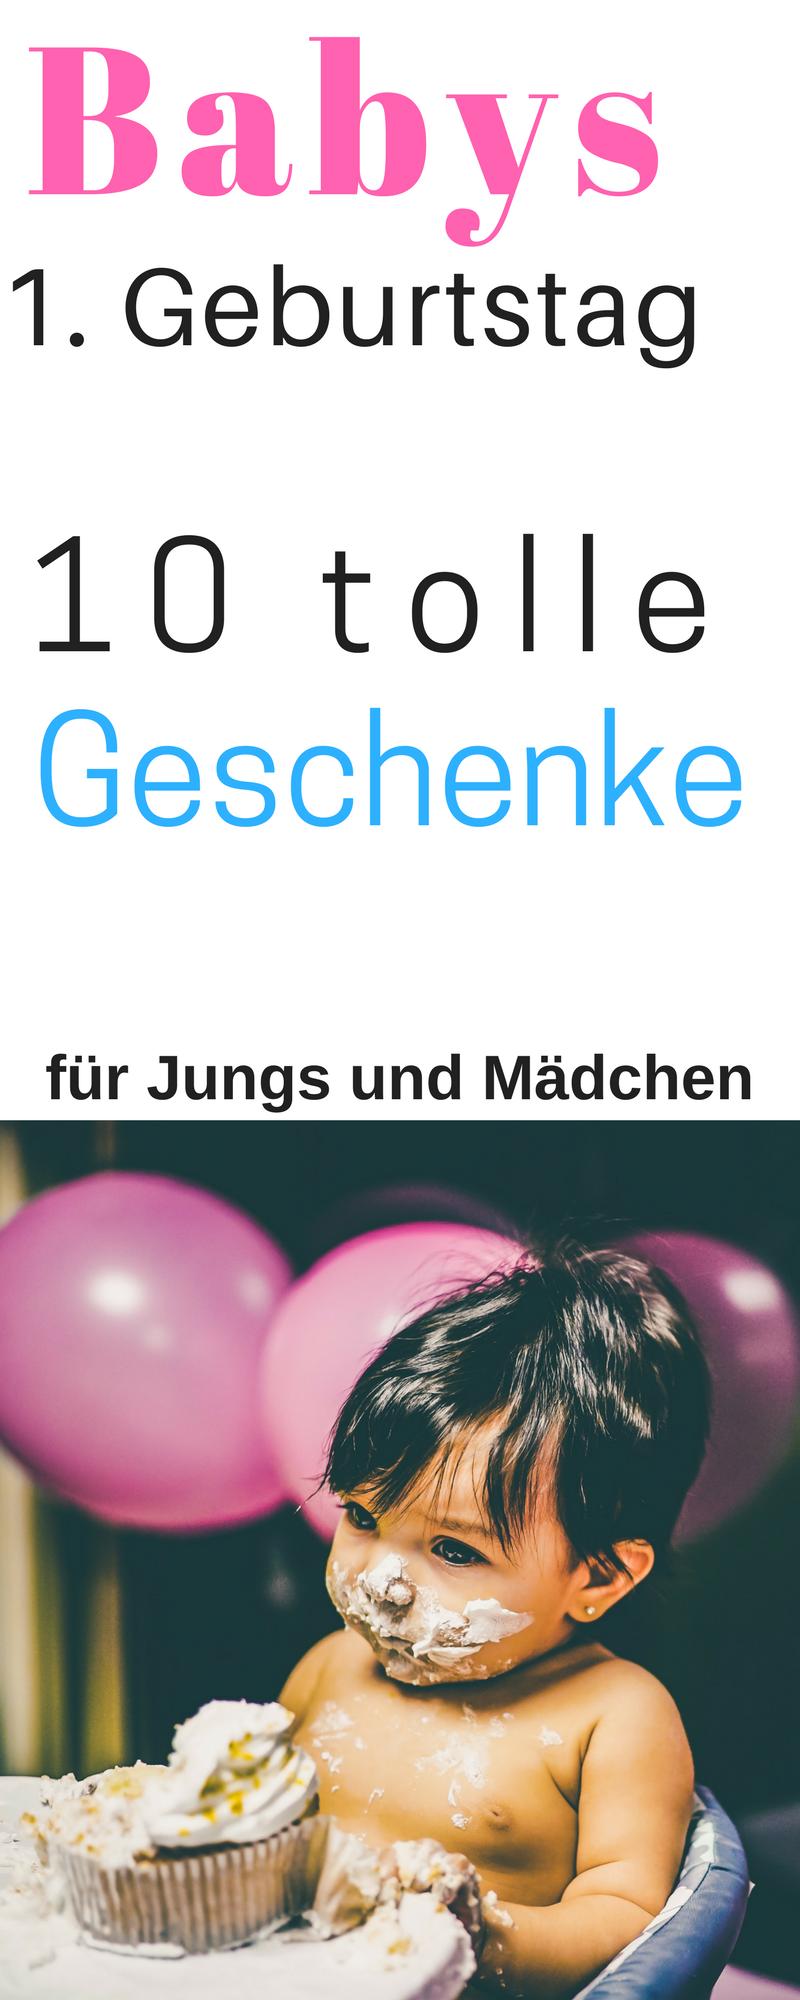 Party Deko Junge 1 Geburtstag 45 Wunderbar Deko Zum 1 Geburtstag